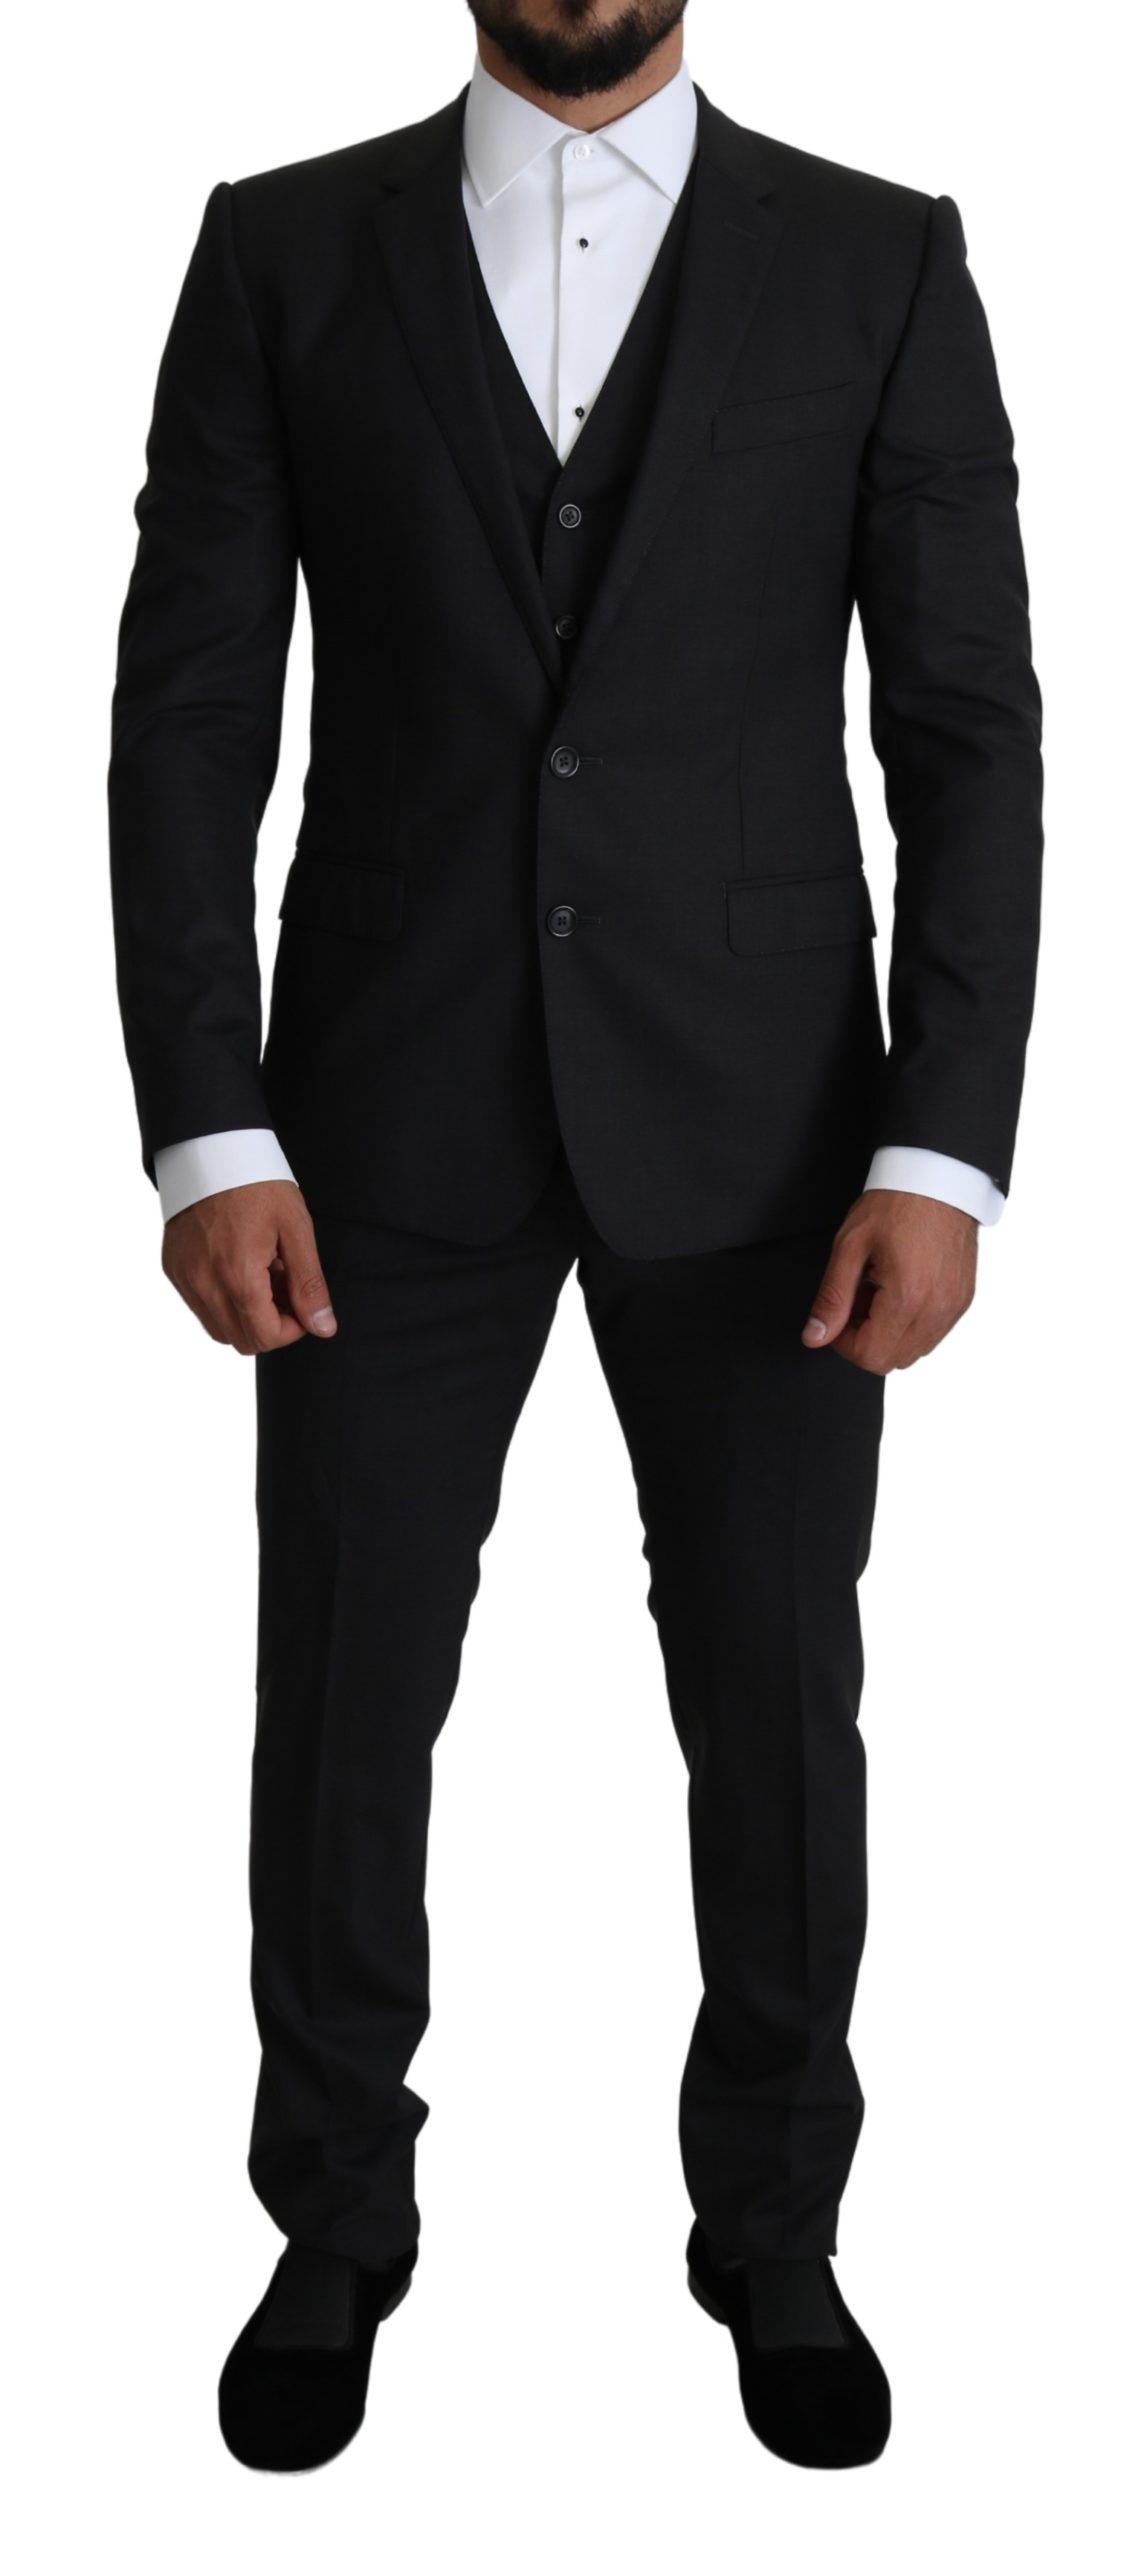 Dolce & Gabbana Men's MARTINI Wool Stretch Suit Gray KOS1818 - IT48 | M